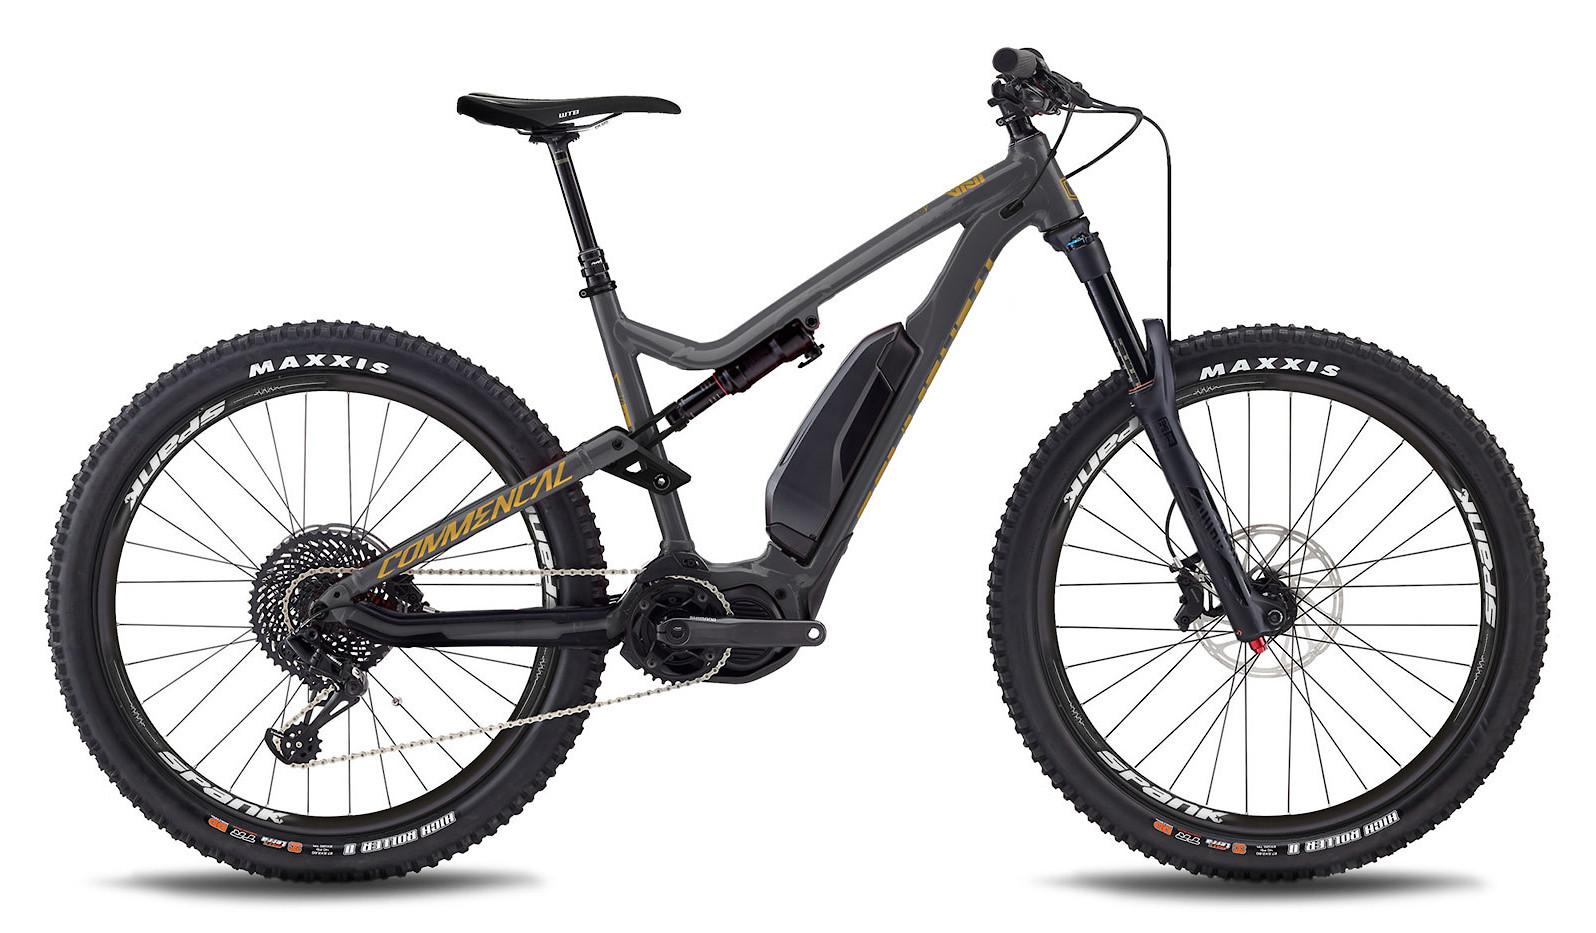 2019 Commencal Meta Power 27 Ride E-Bike